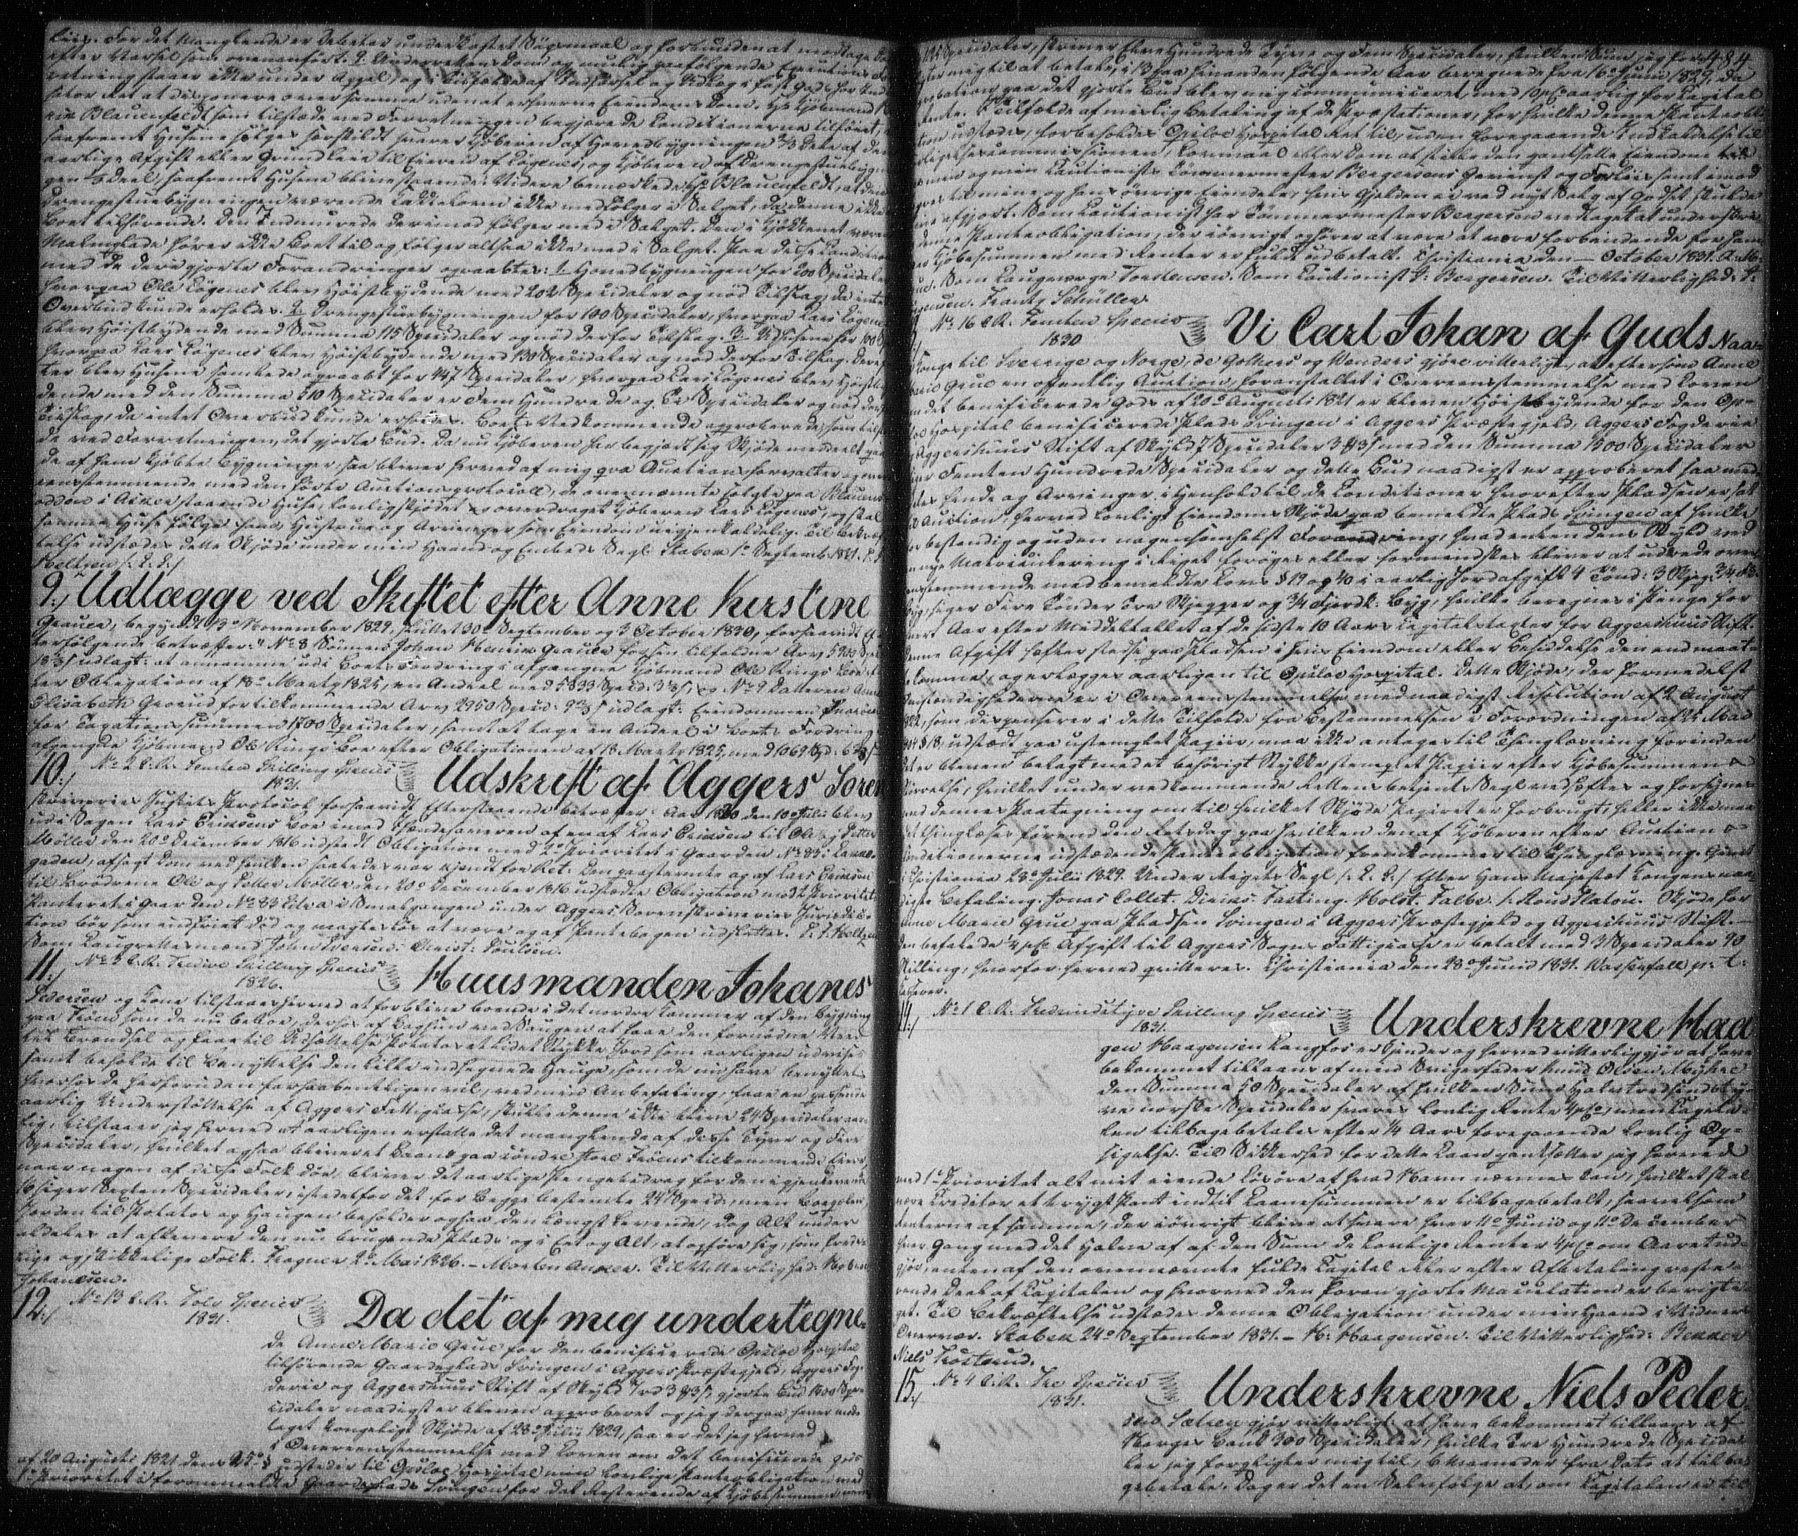 SAO, Aker sorenskriveri, G/Gb/Gba/L0009: Pantebok nr. I 9, 1824-1833, s. 484